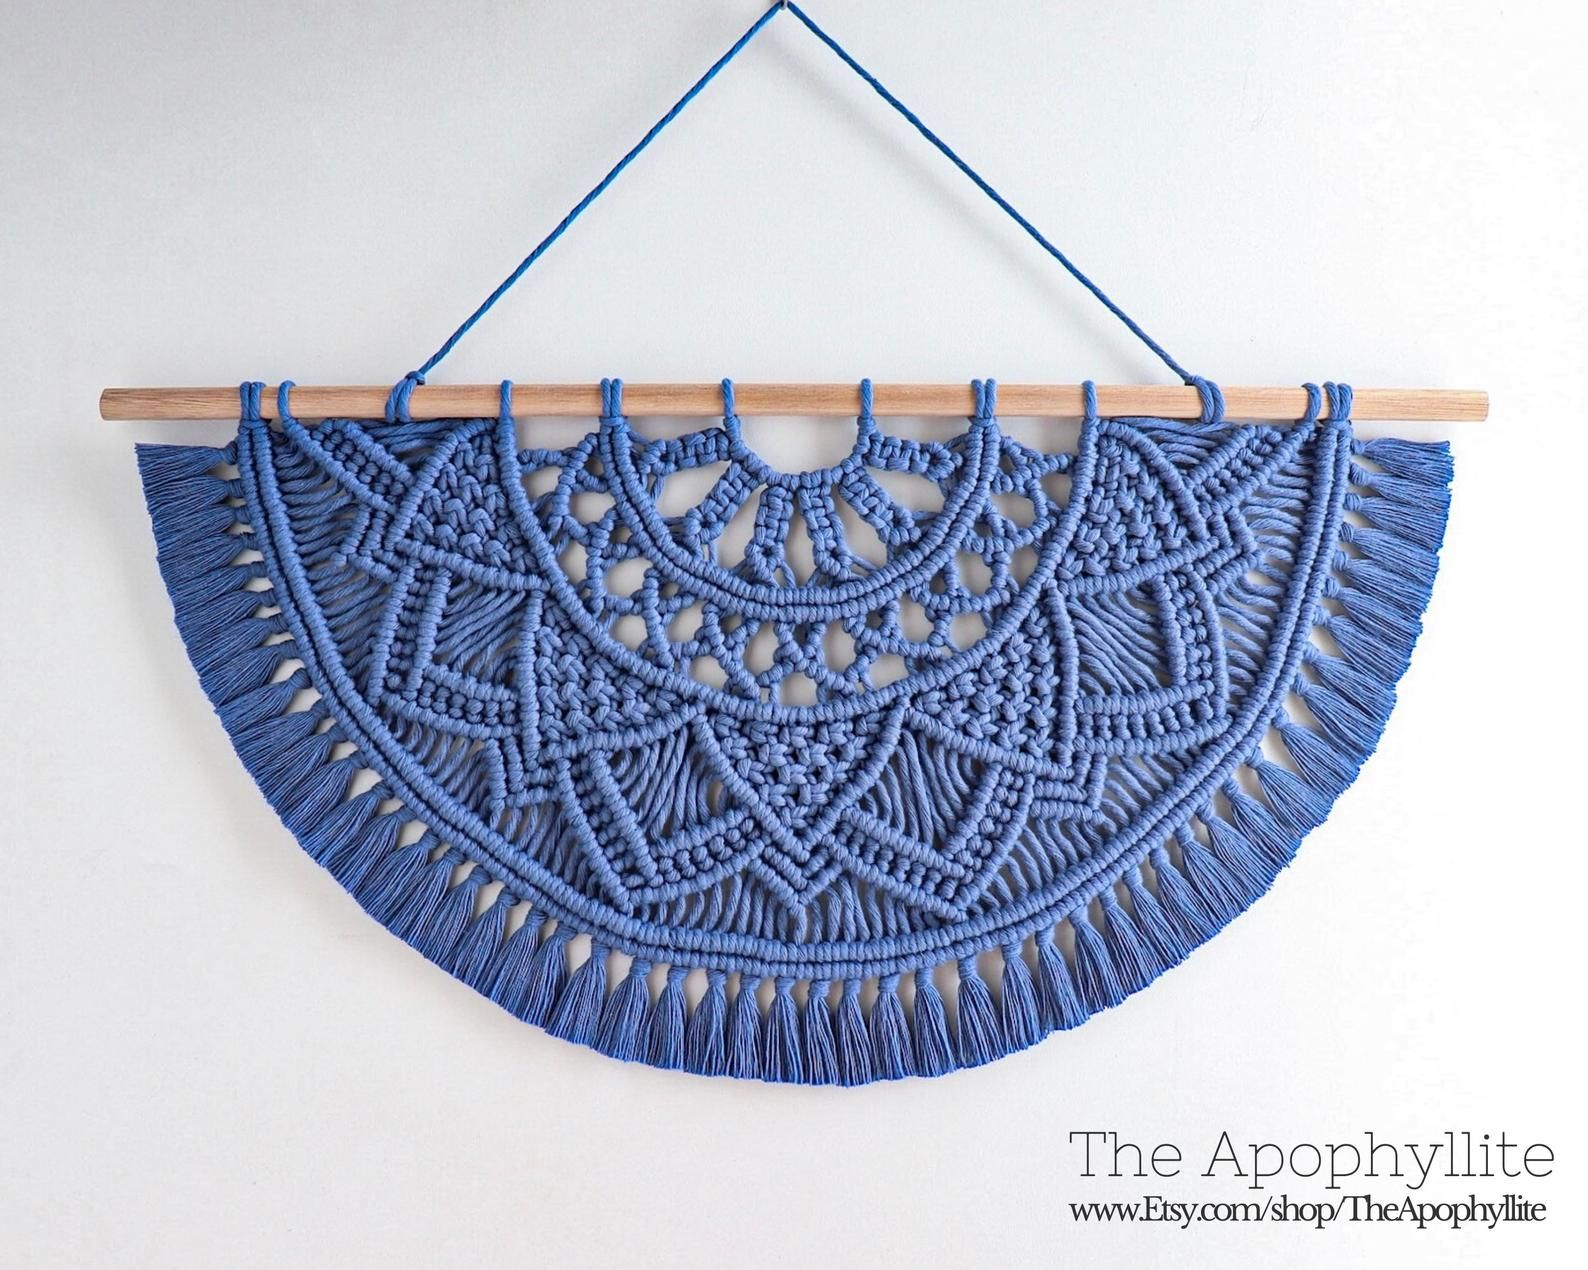 Macrame wall hanging, dark blue cotton Semi-circle half mandala design on oak wood dowel. Macrame tapestry, Living room entryway bedroom art